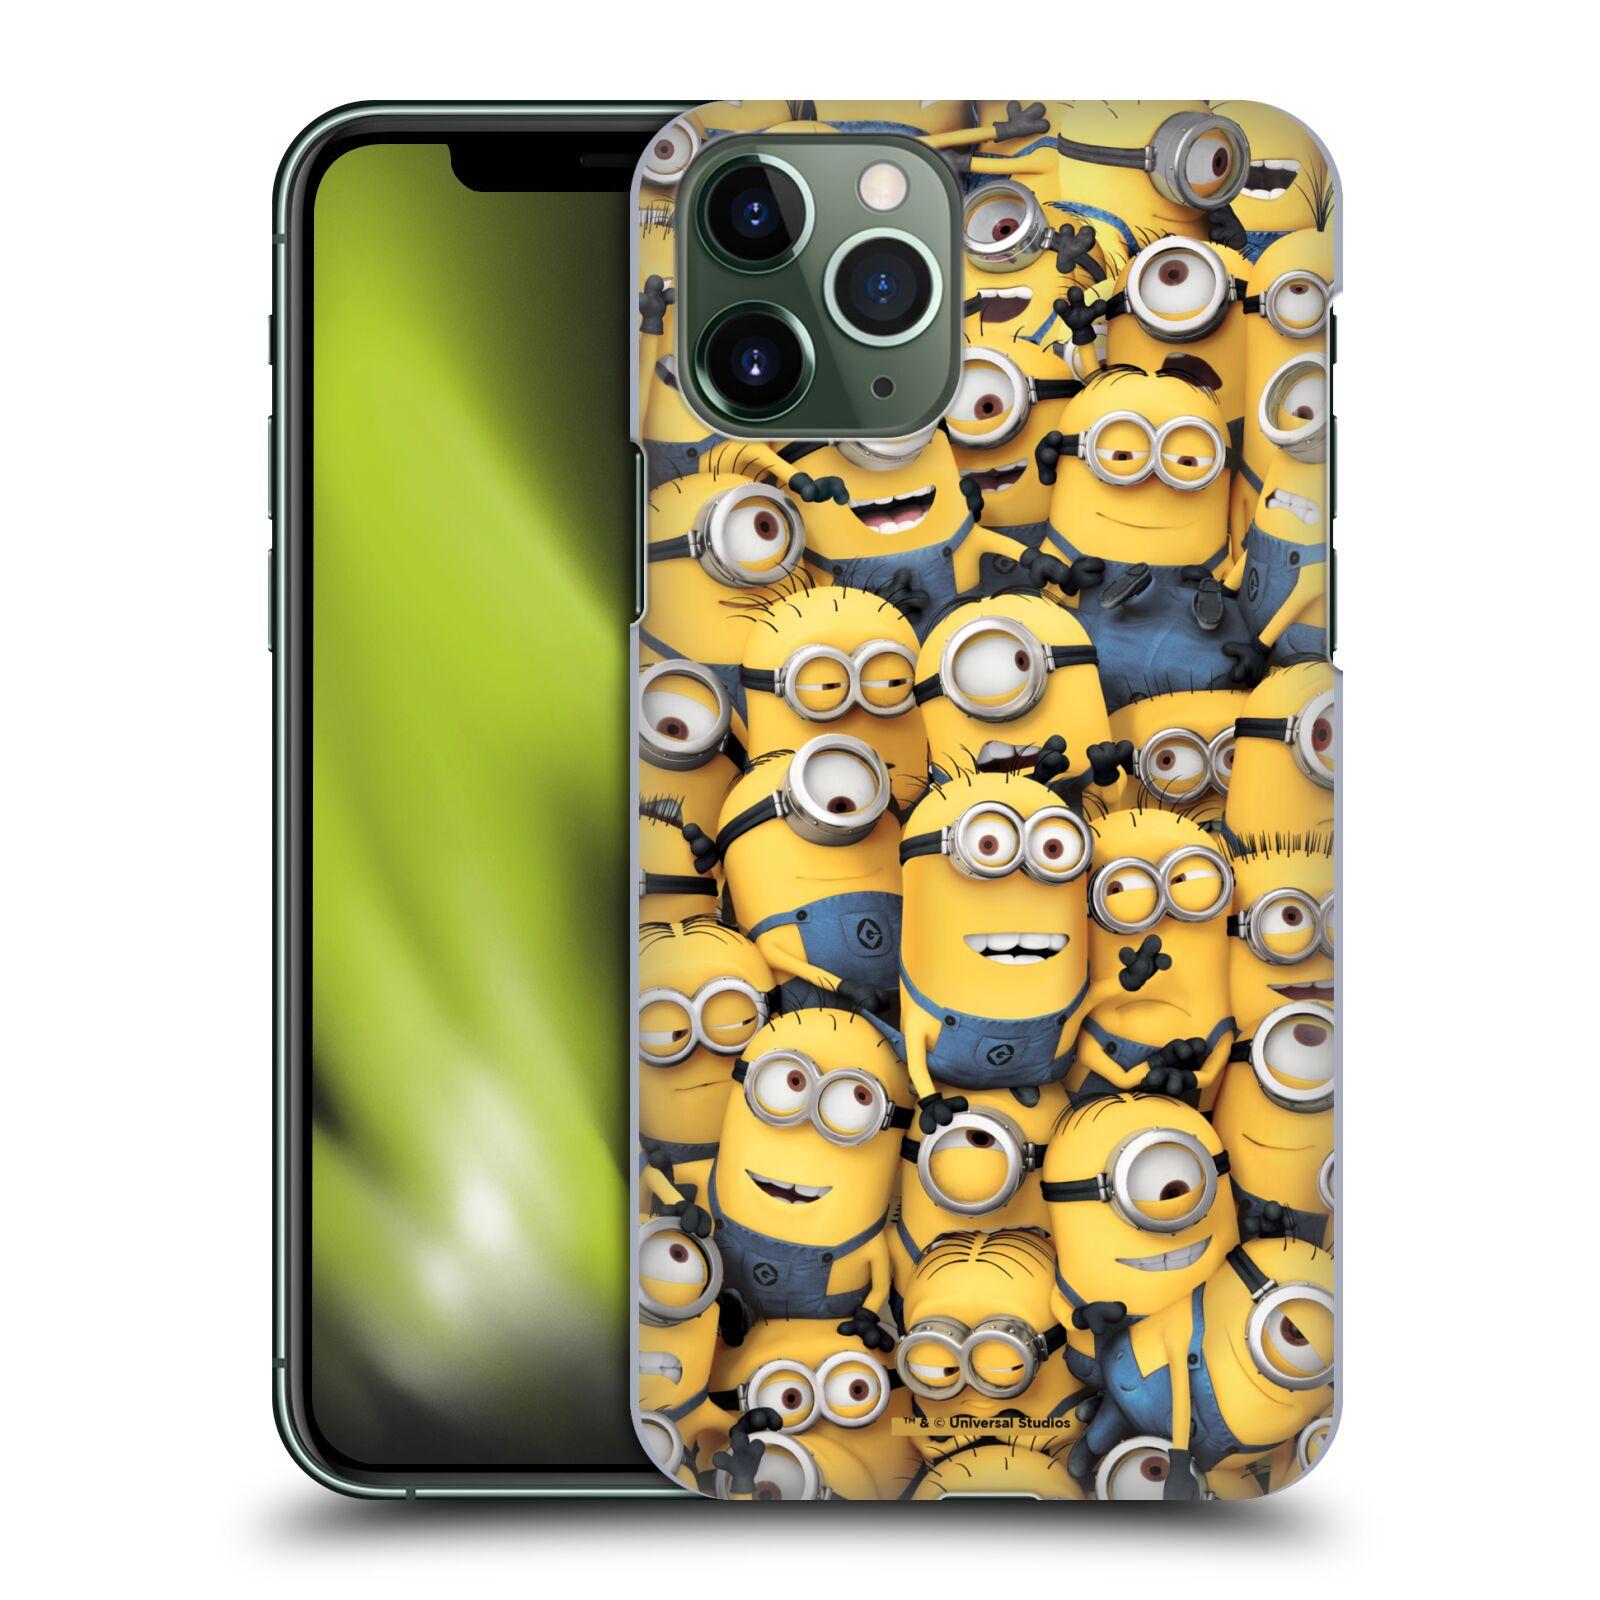 Plastové pouzdro na mobil Apple iPhone 11 Pro - Head Case - Mimoni všude z filmu Já, padouch - Despicable Me